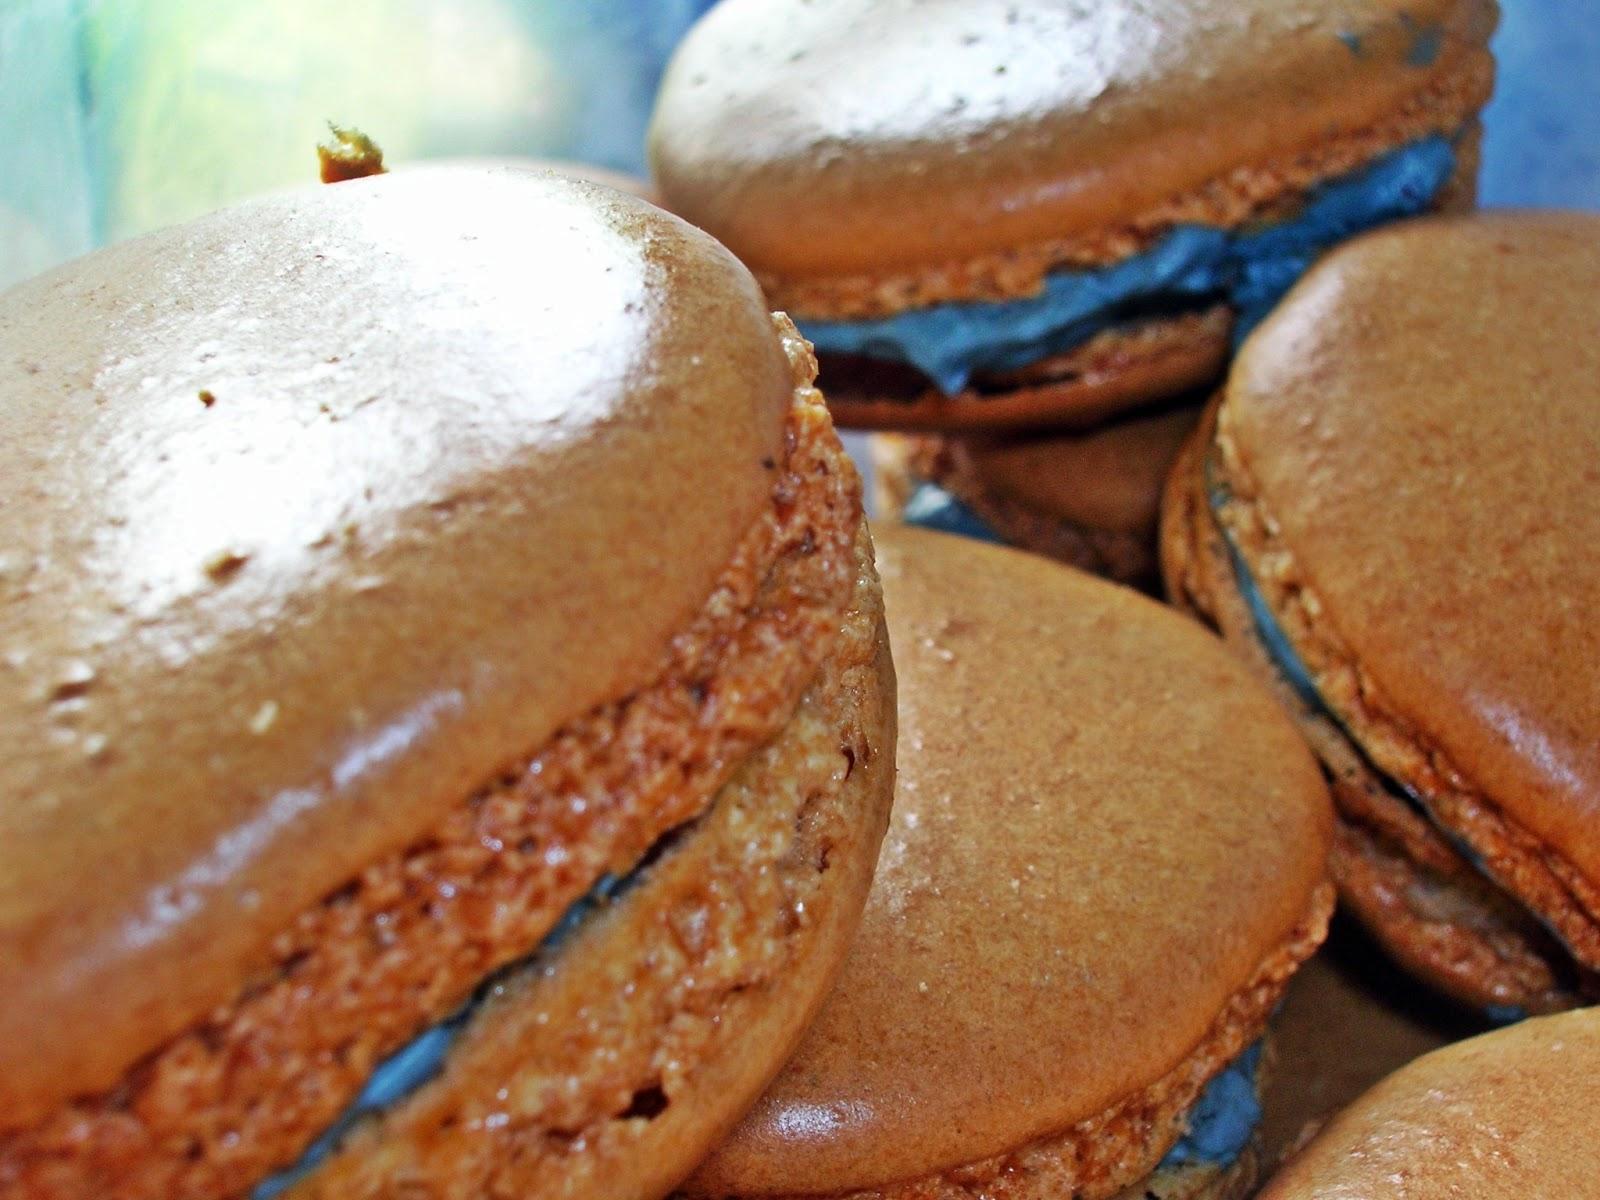 macarons buerre noisette macarons chilli chocolate macarons chocolate ...